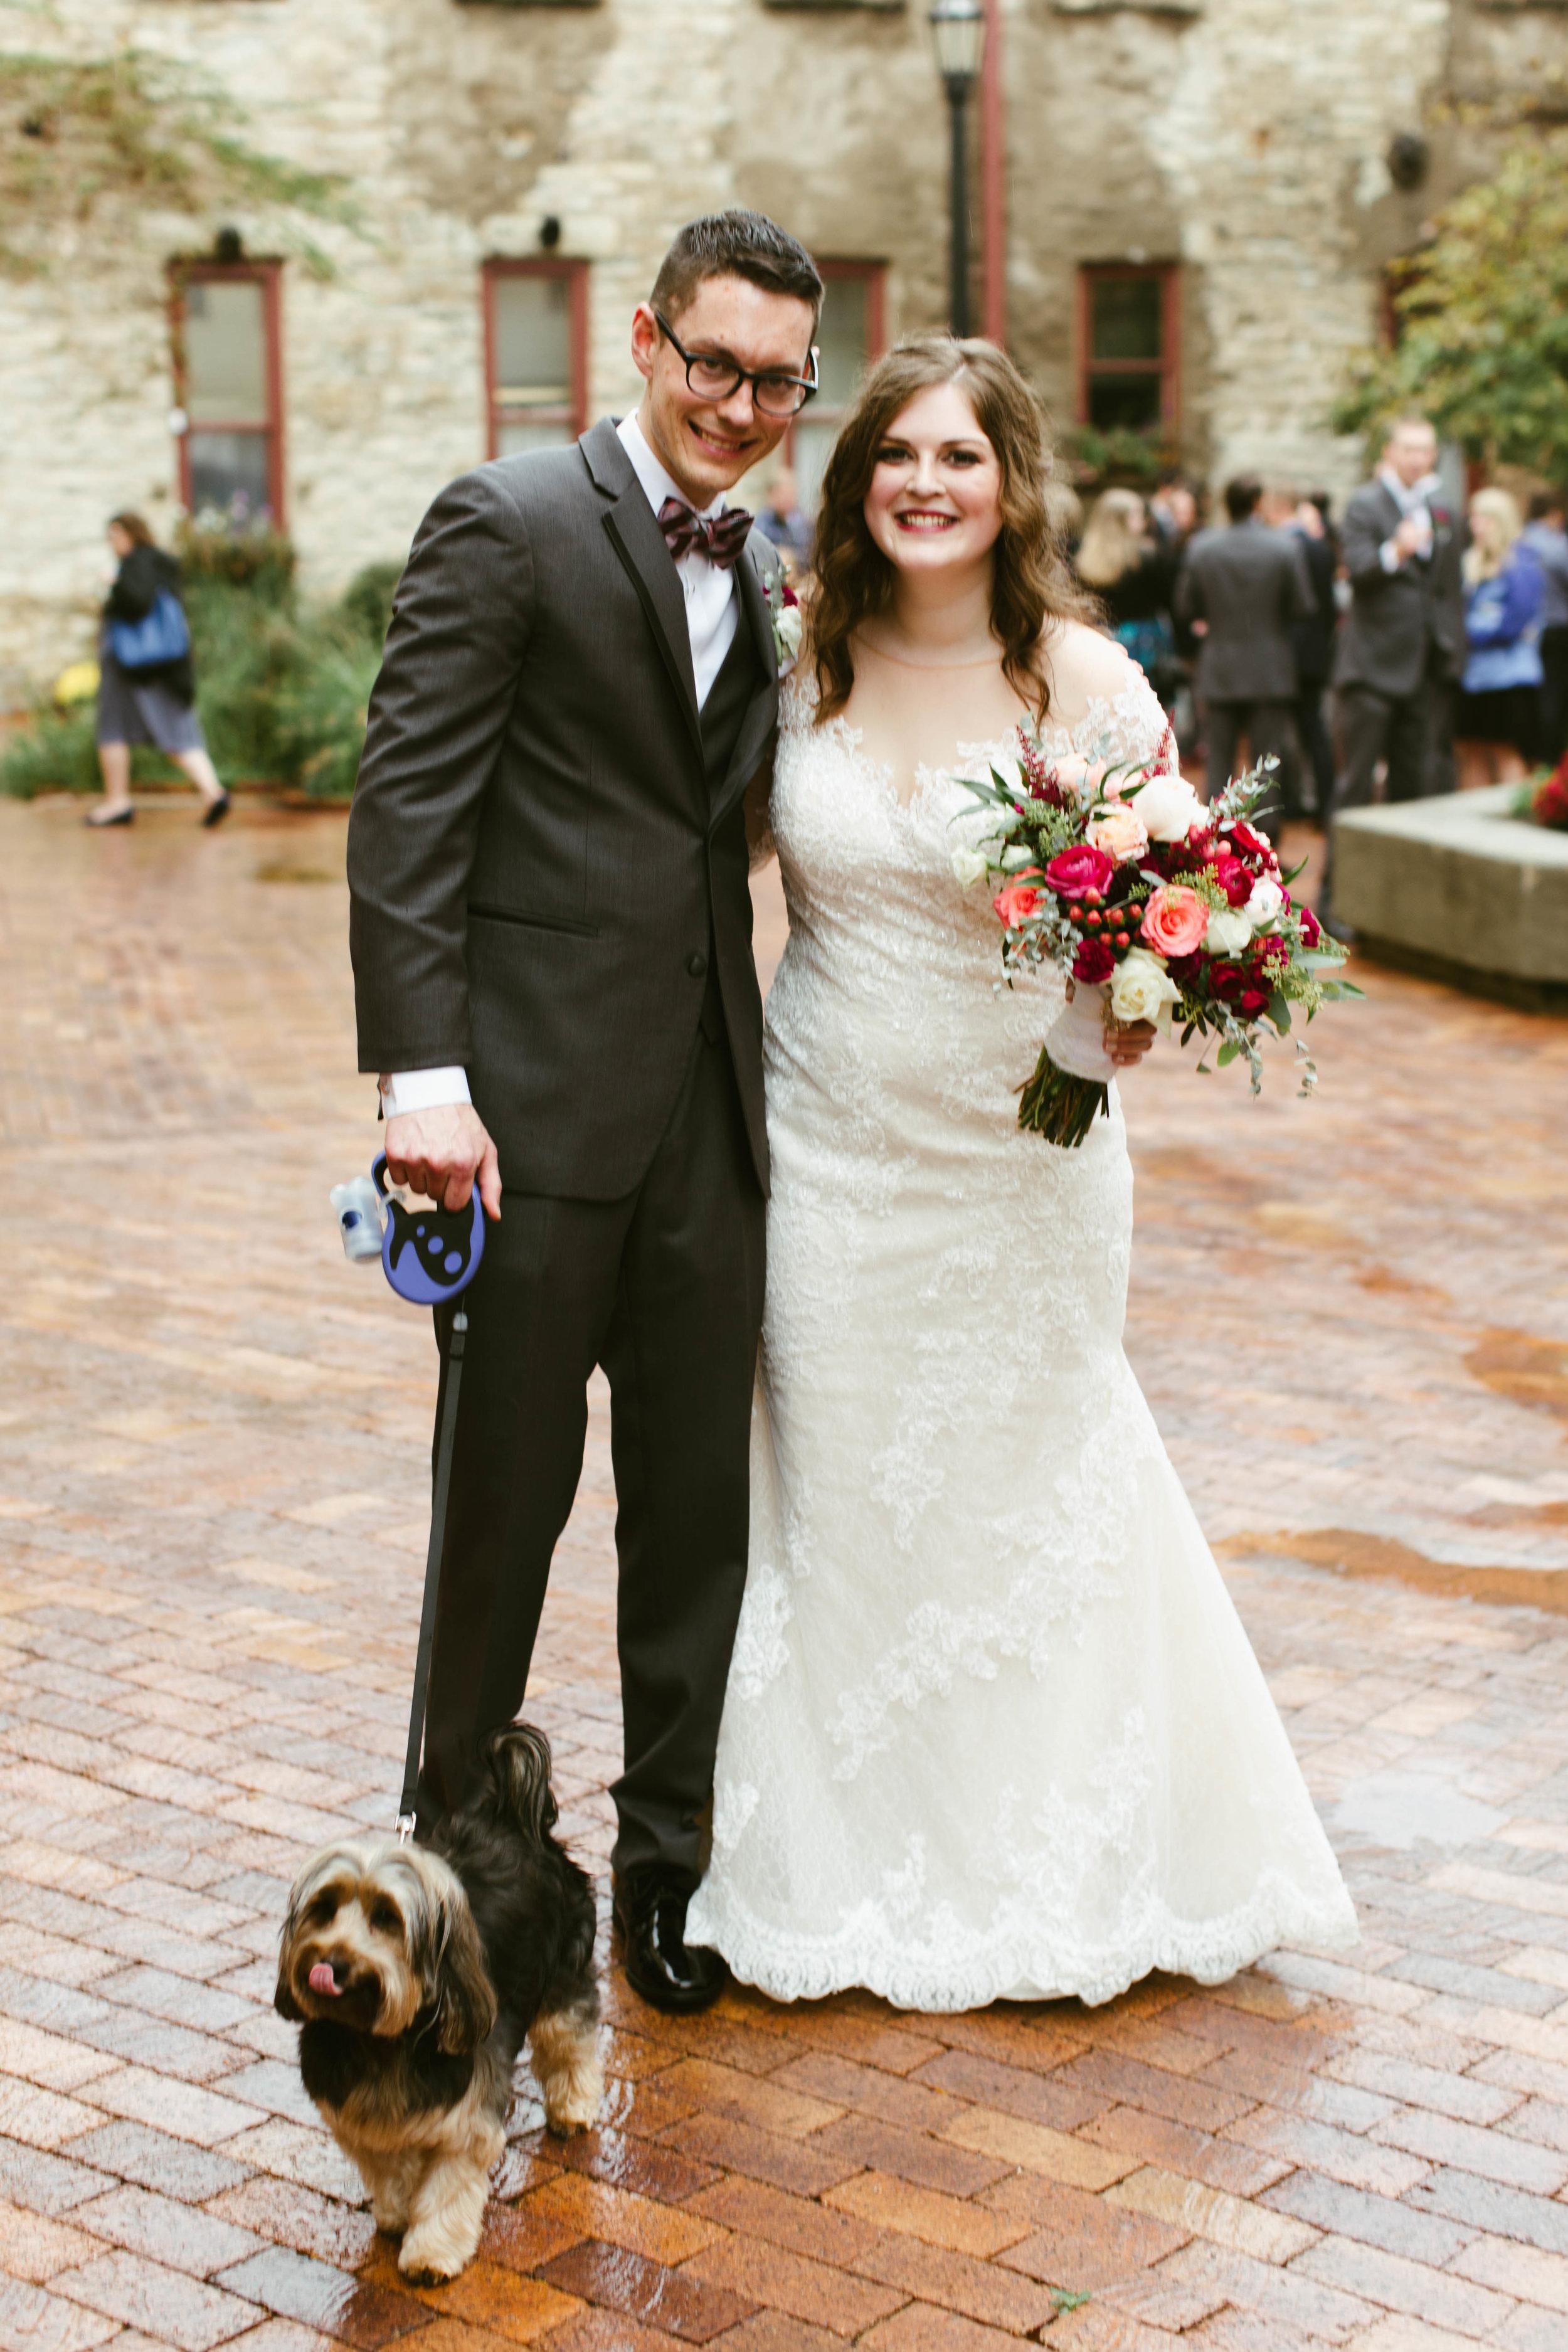 jennahazelphotography-marcy+ben-wedding-0770.jpg